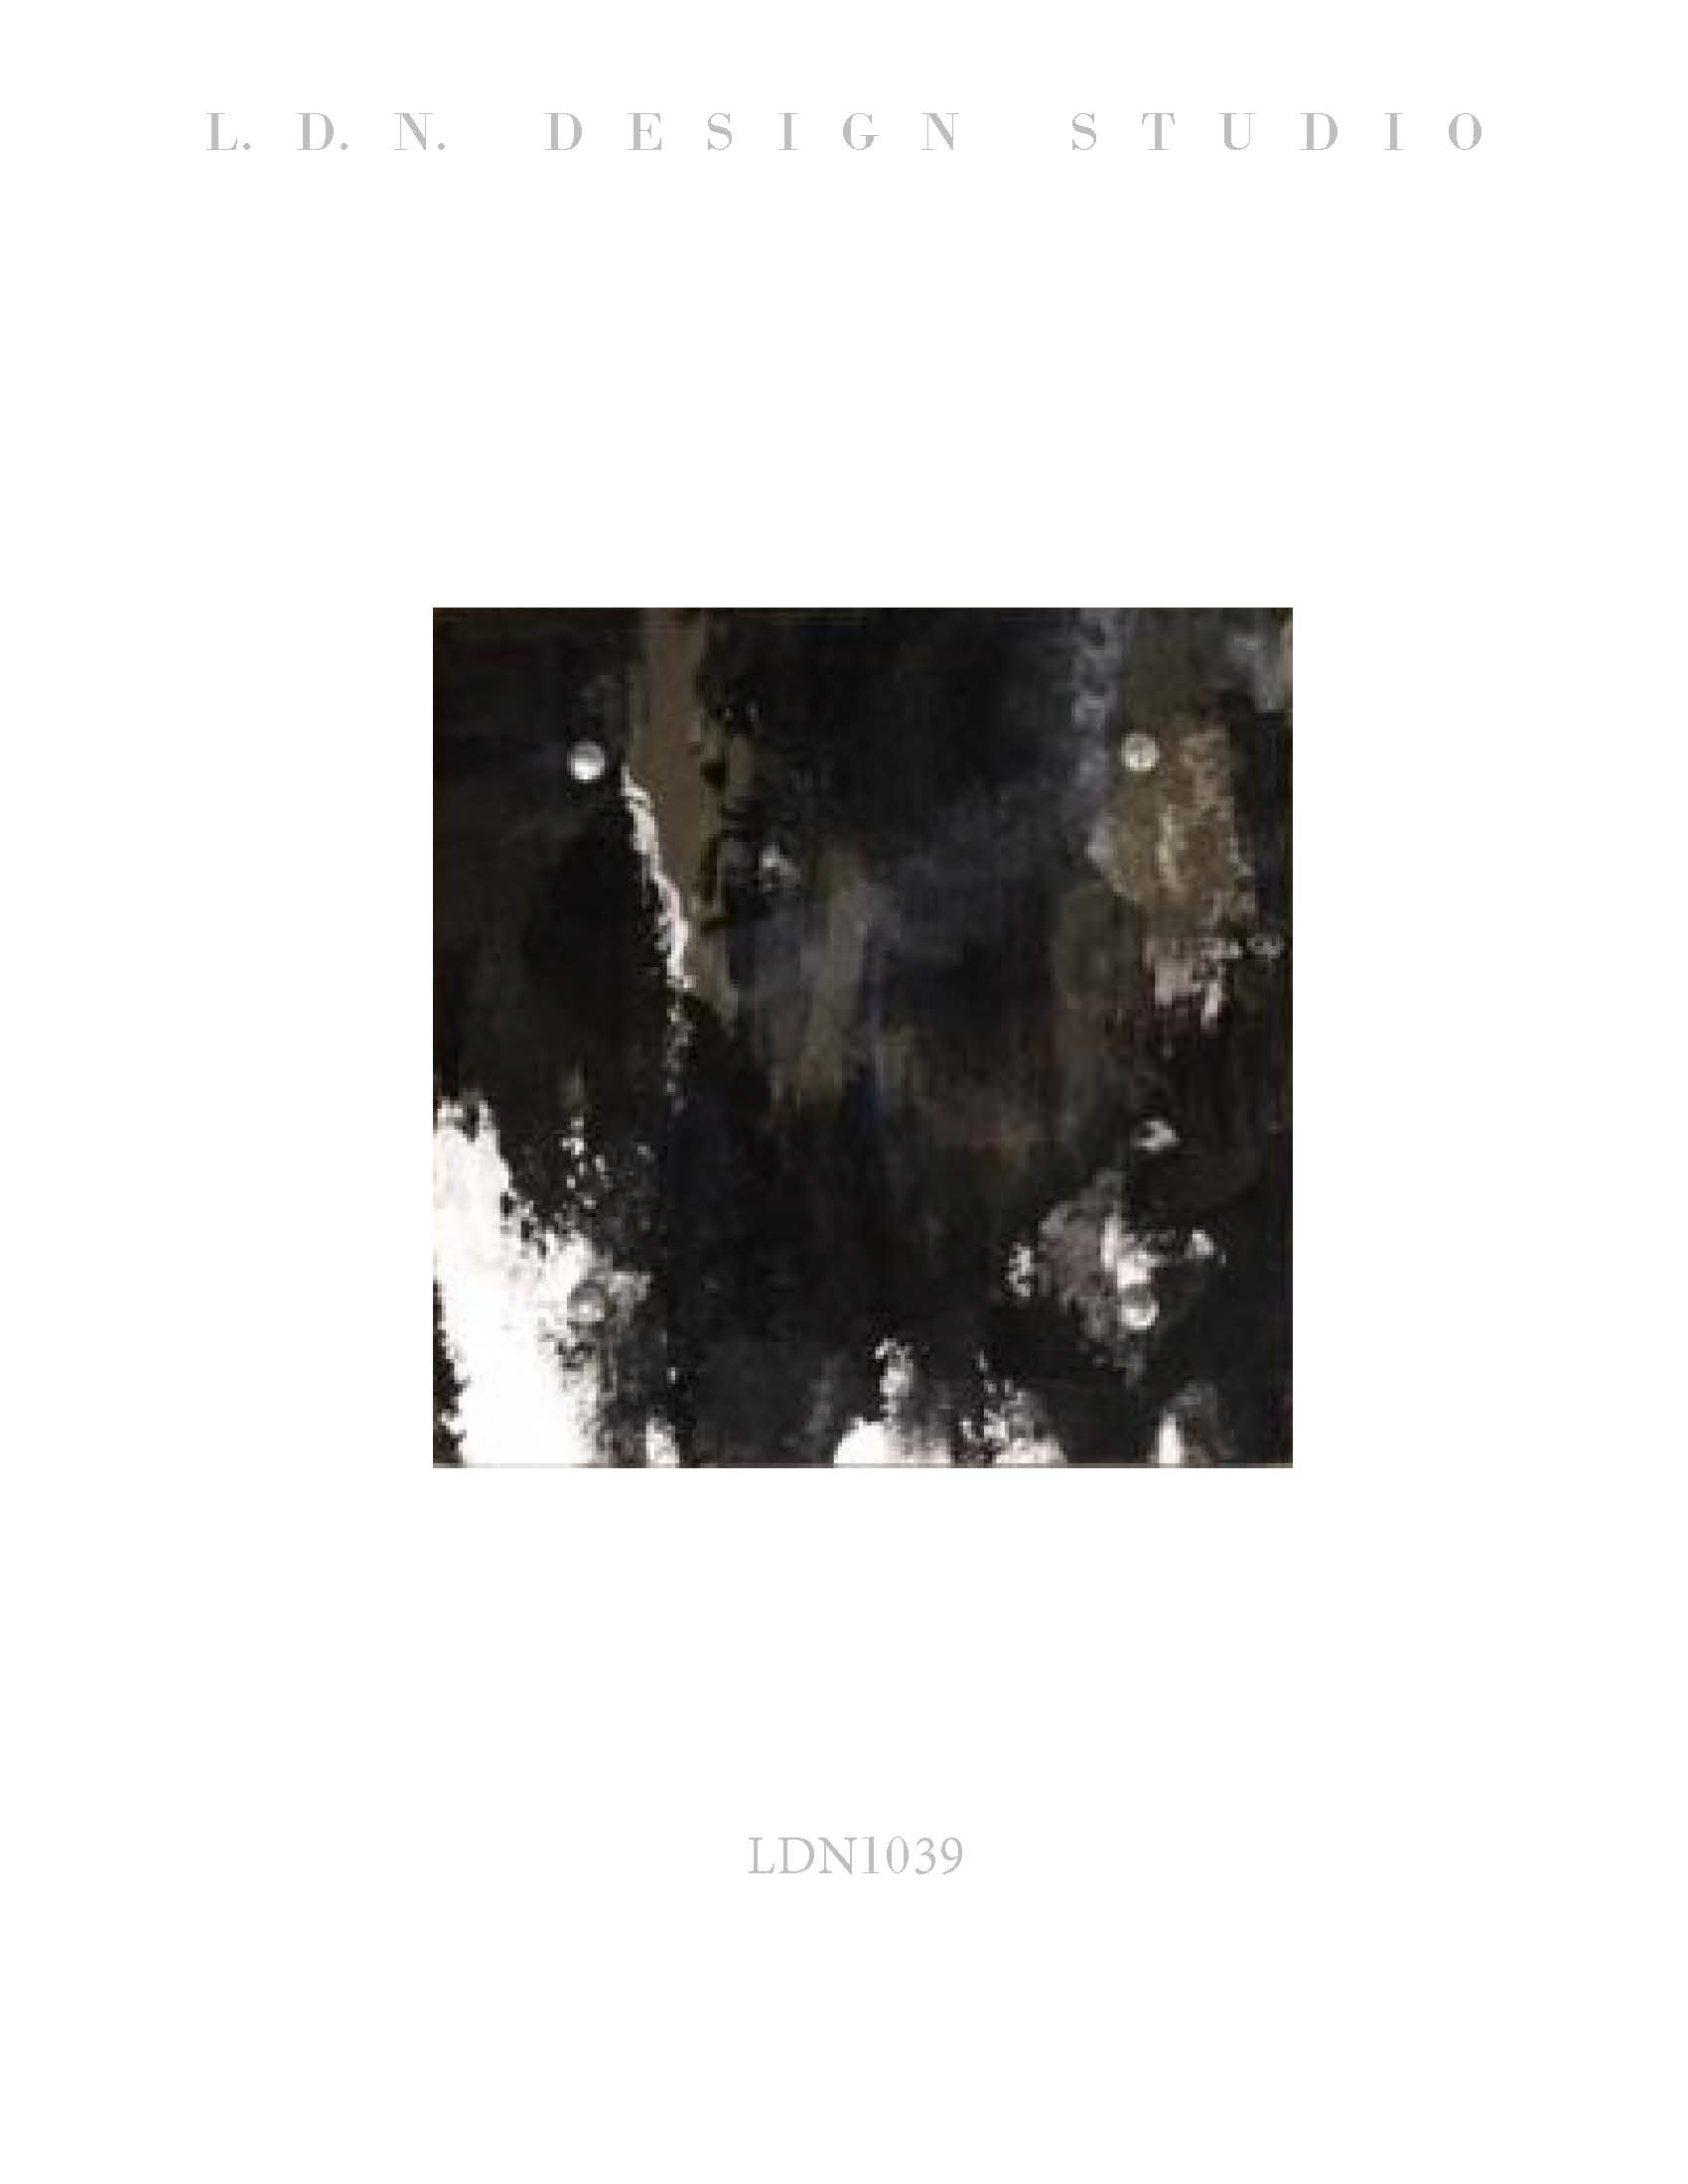 LDN1039